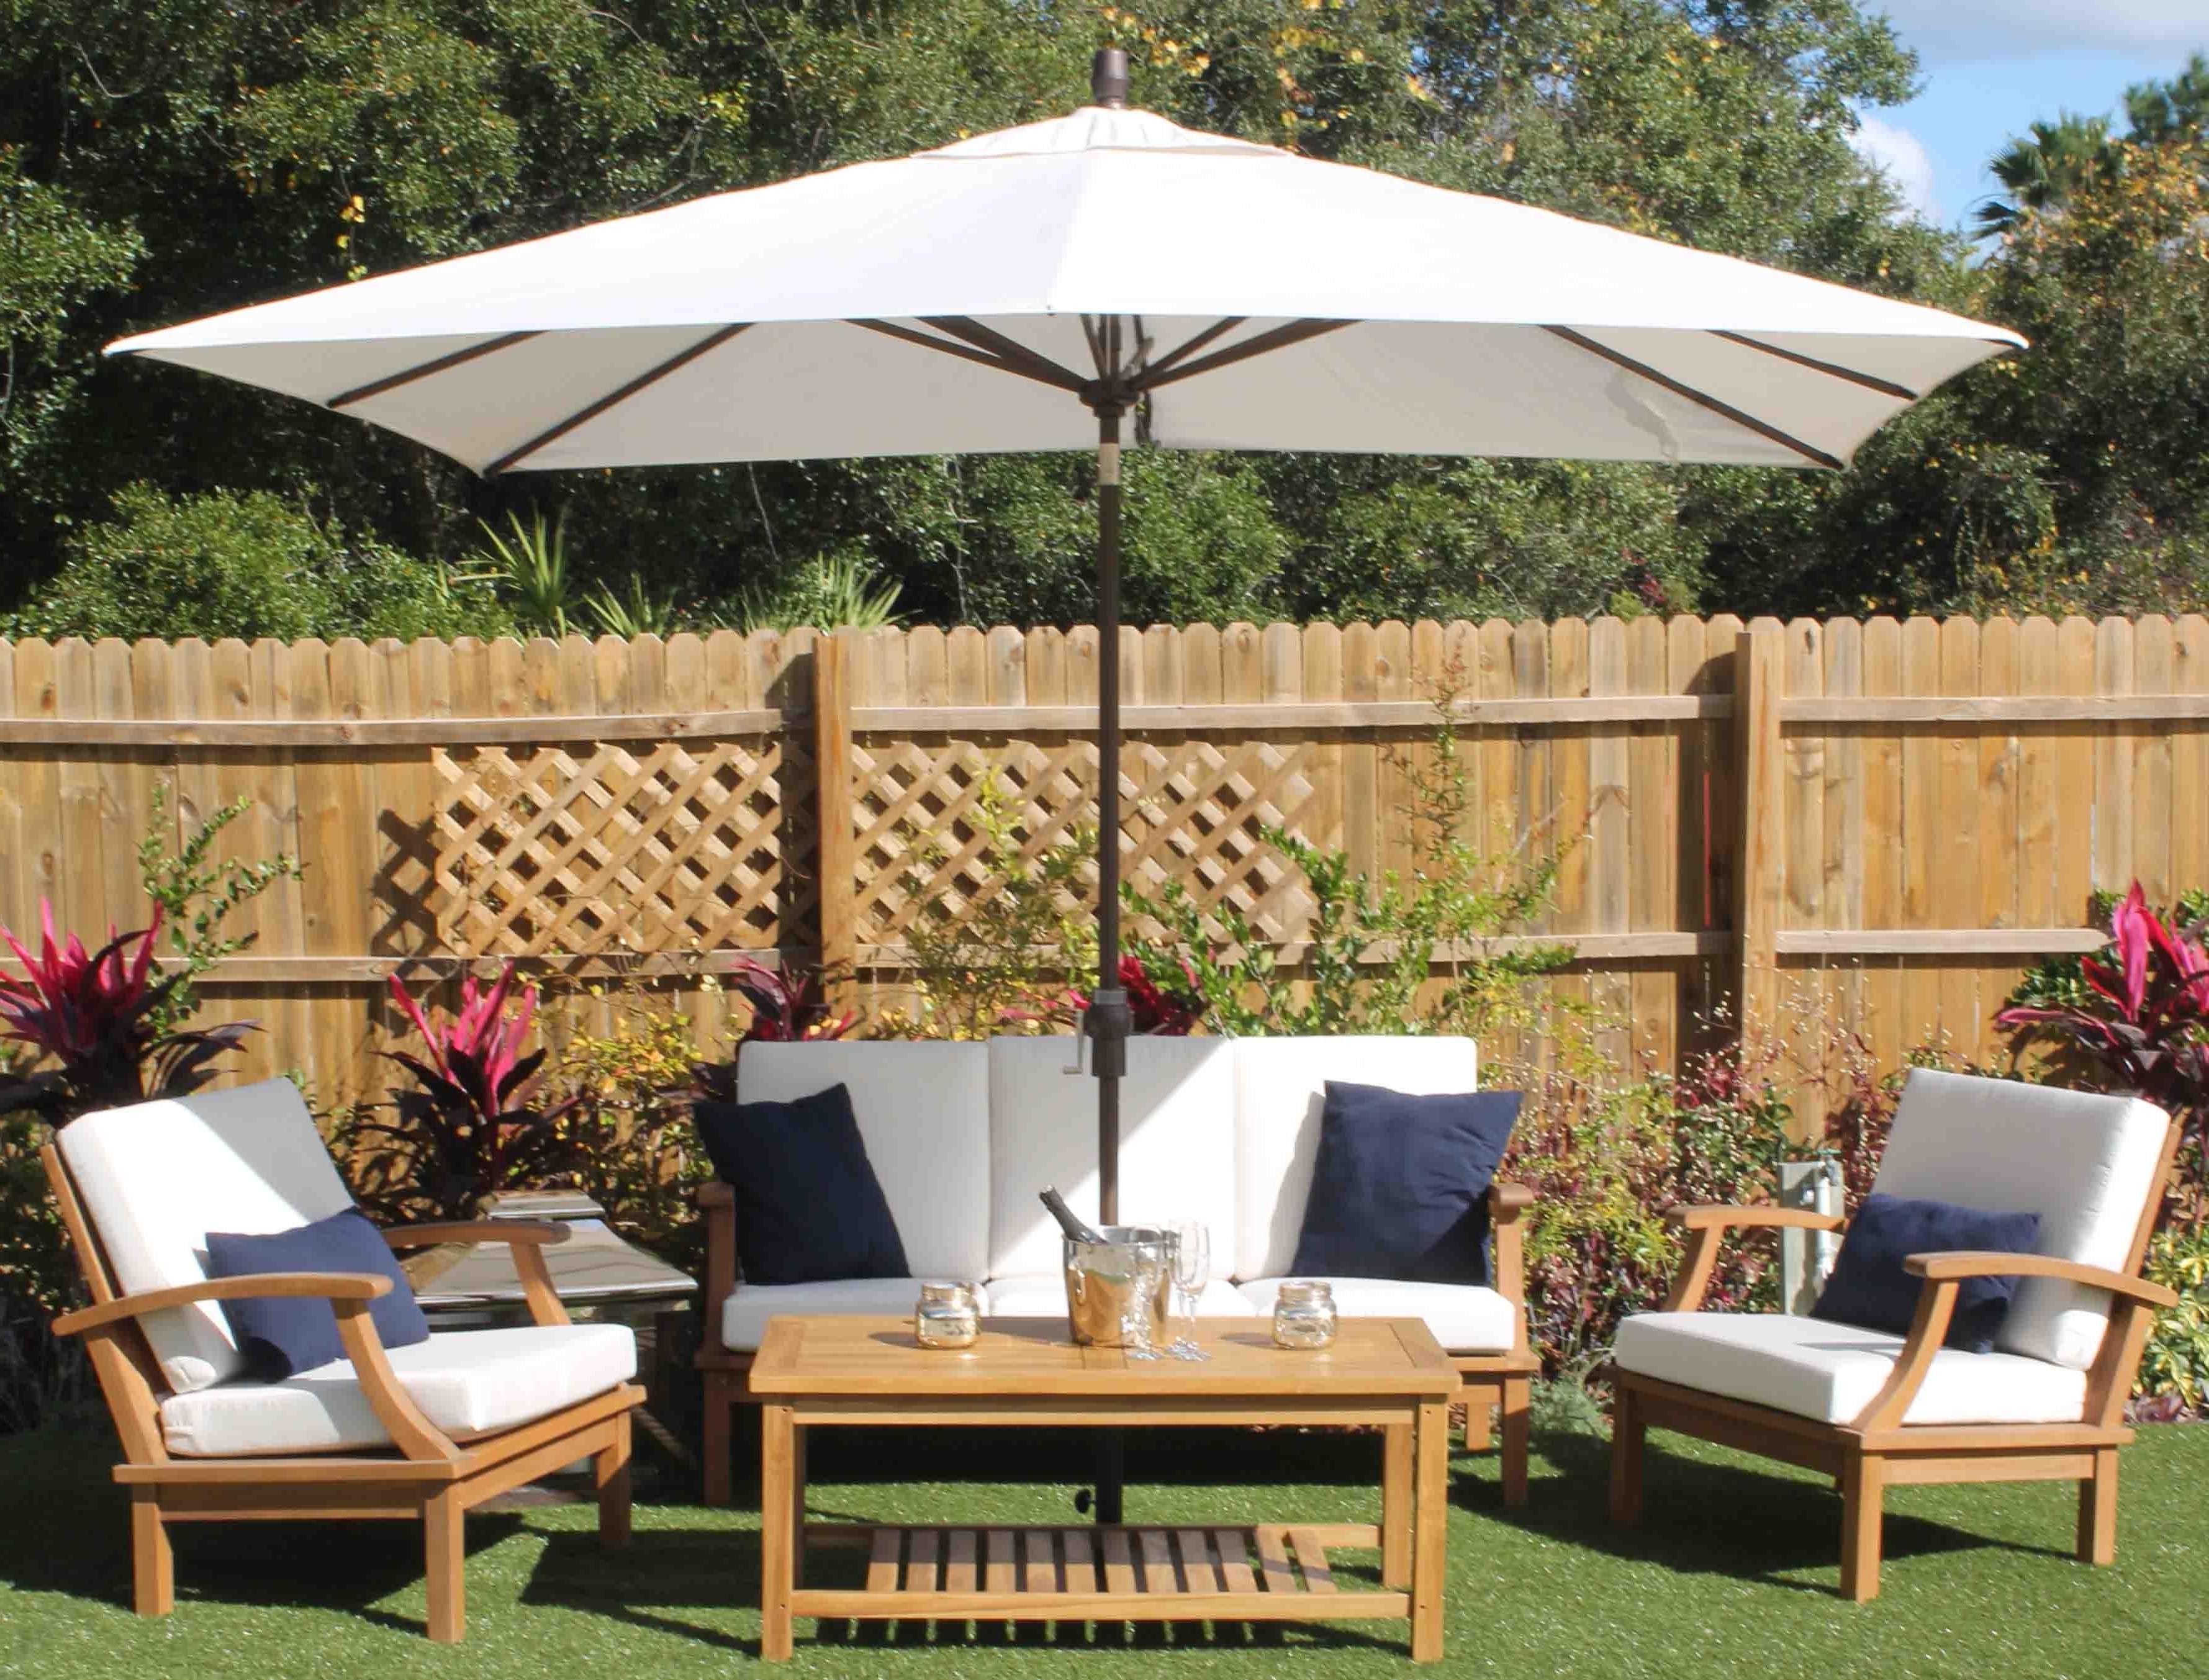 Sunbrella Outdoor Patio Umbrellas For Best And Newest 48 Rectangular Sunbrella Patio Umbrellas, 6#039; X 10#039; Sunbrella (View 13 of 20)